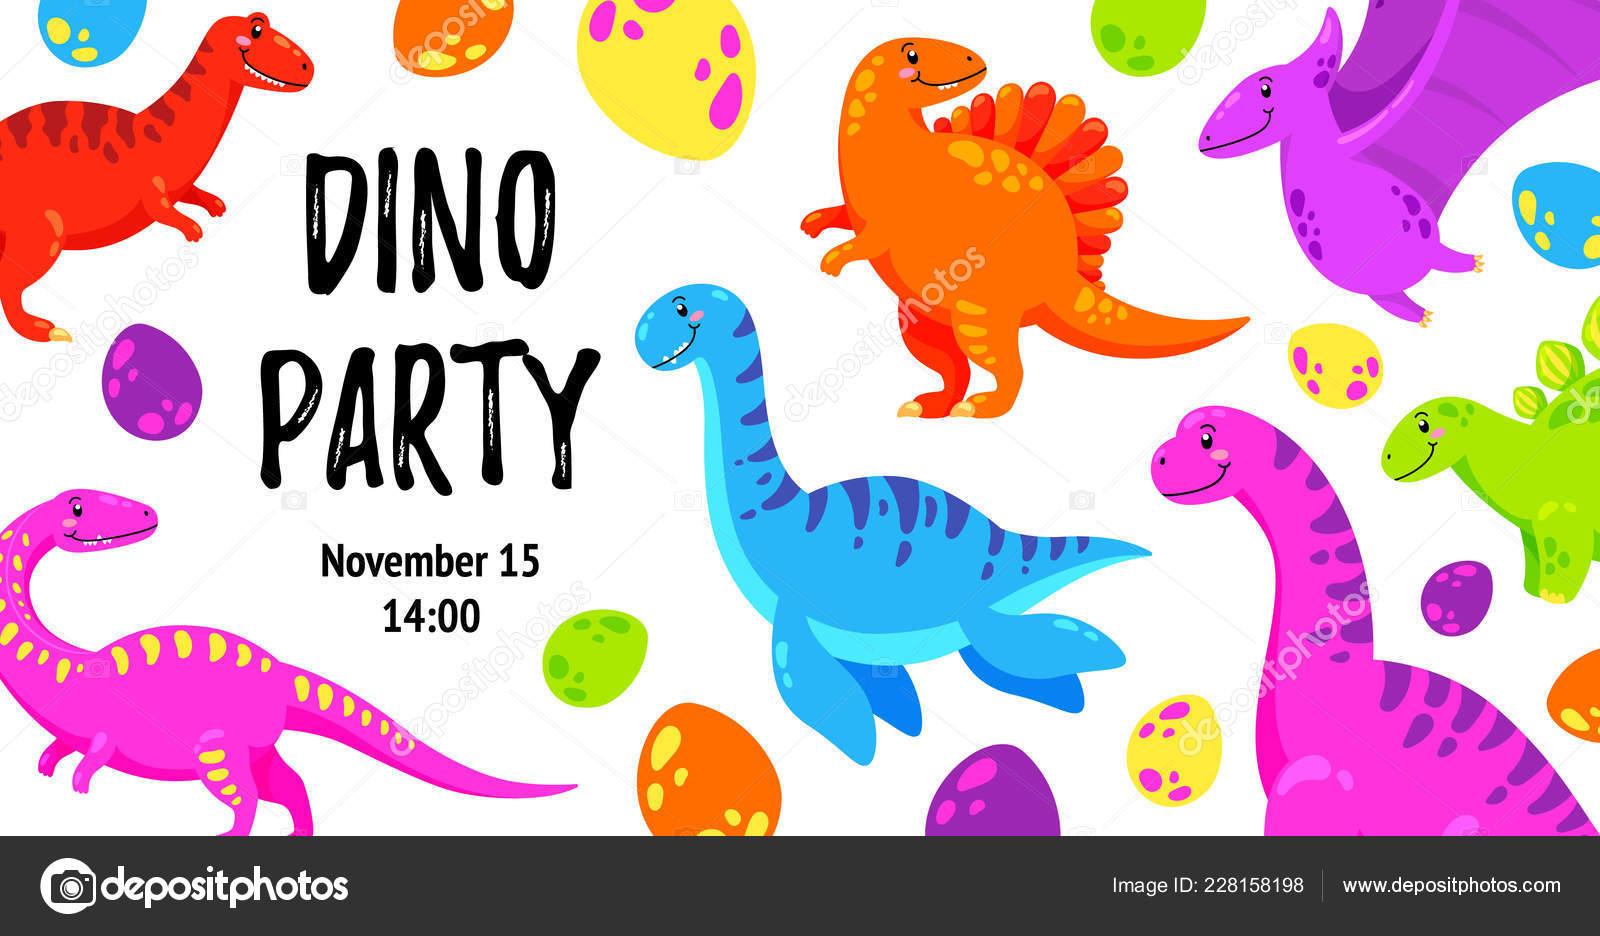 Linda Tarjeta Felicitación Con Dinosaurio Invitación Fiesta